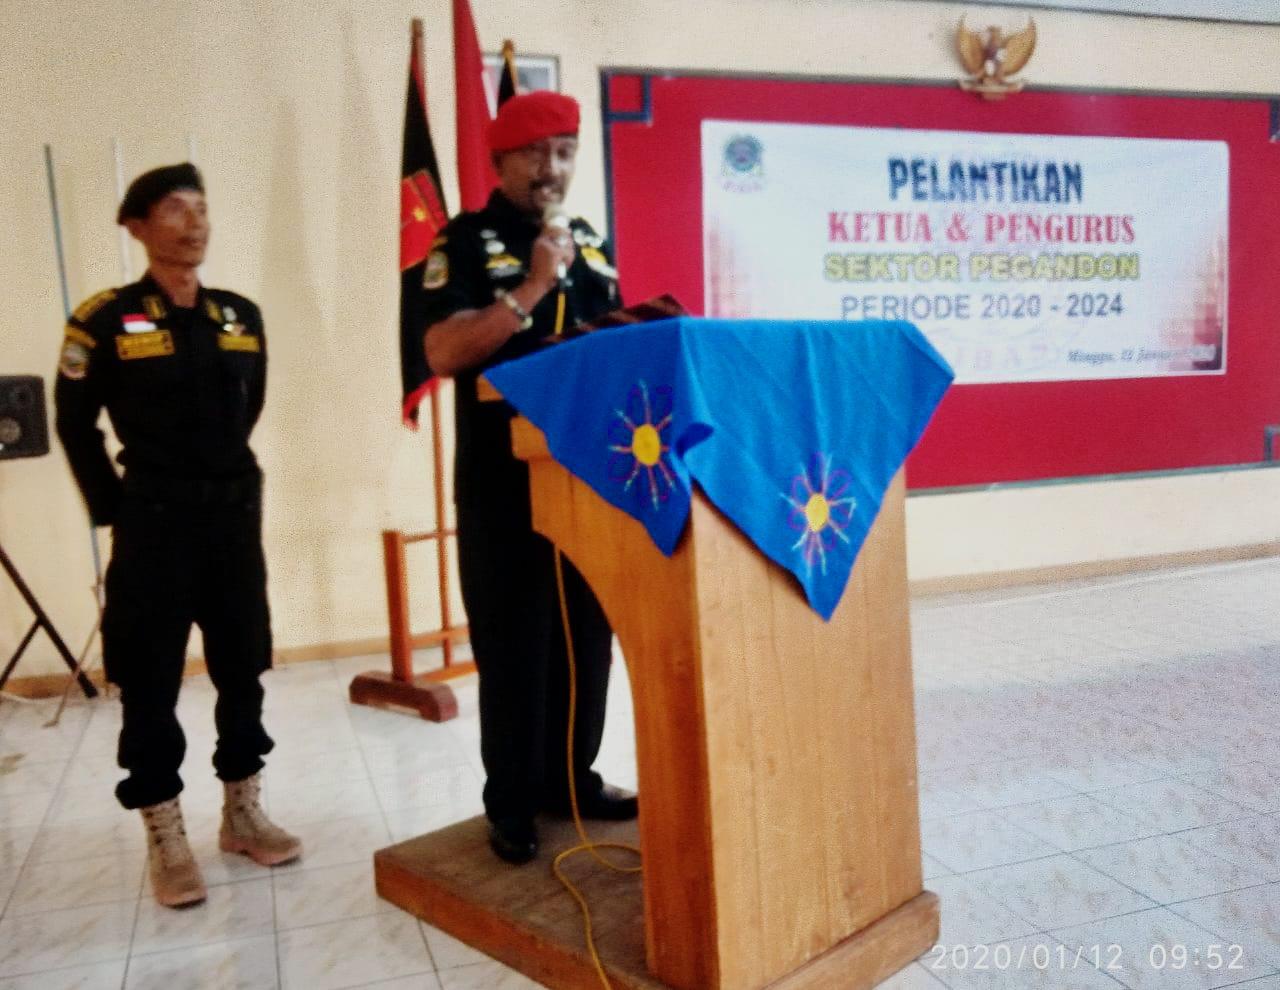 Ketua GIBAS Kendal Bersama Pengurus Melantik Ketua GIBAS Pegandon Periode 2020 - 2024